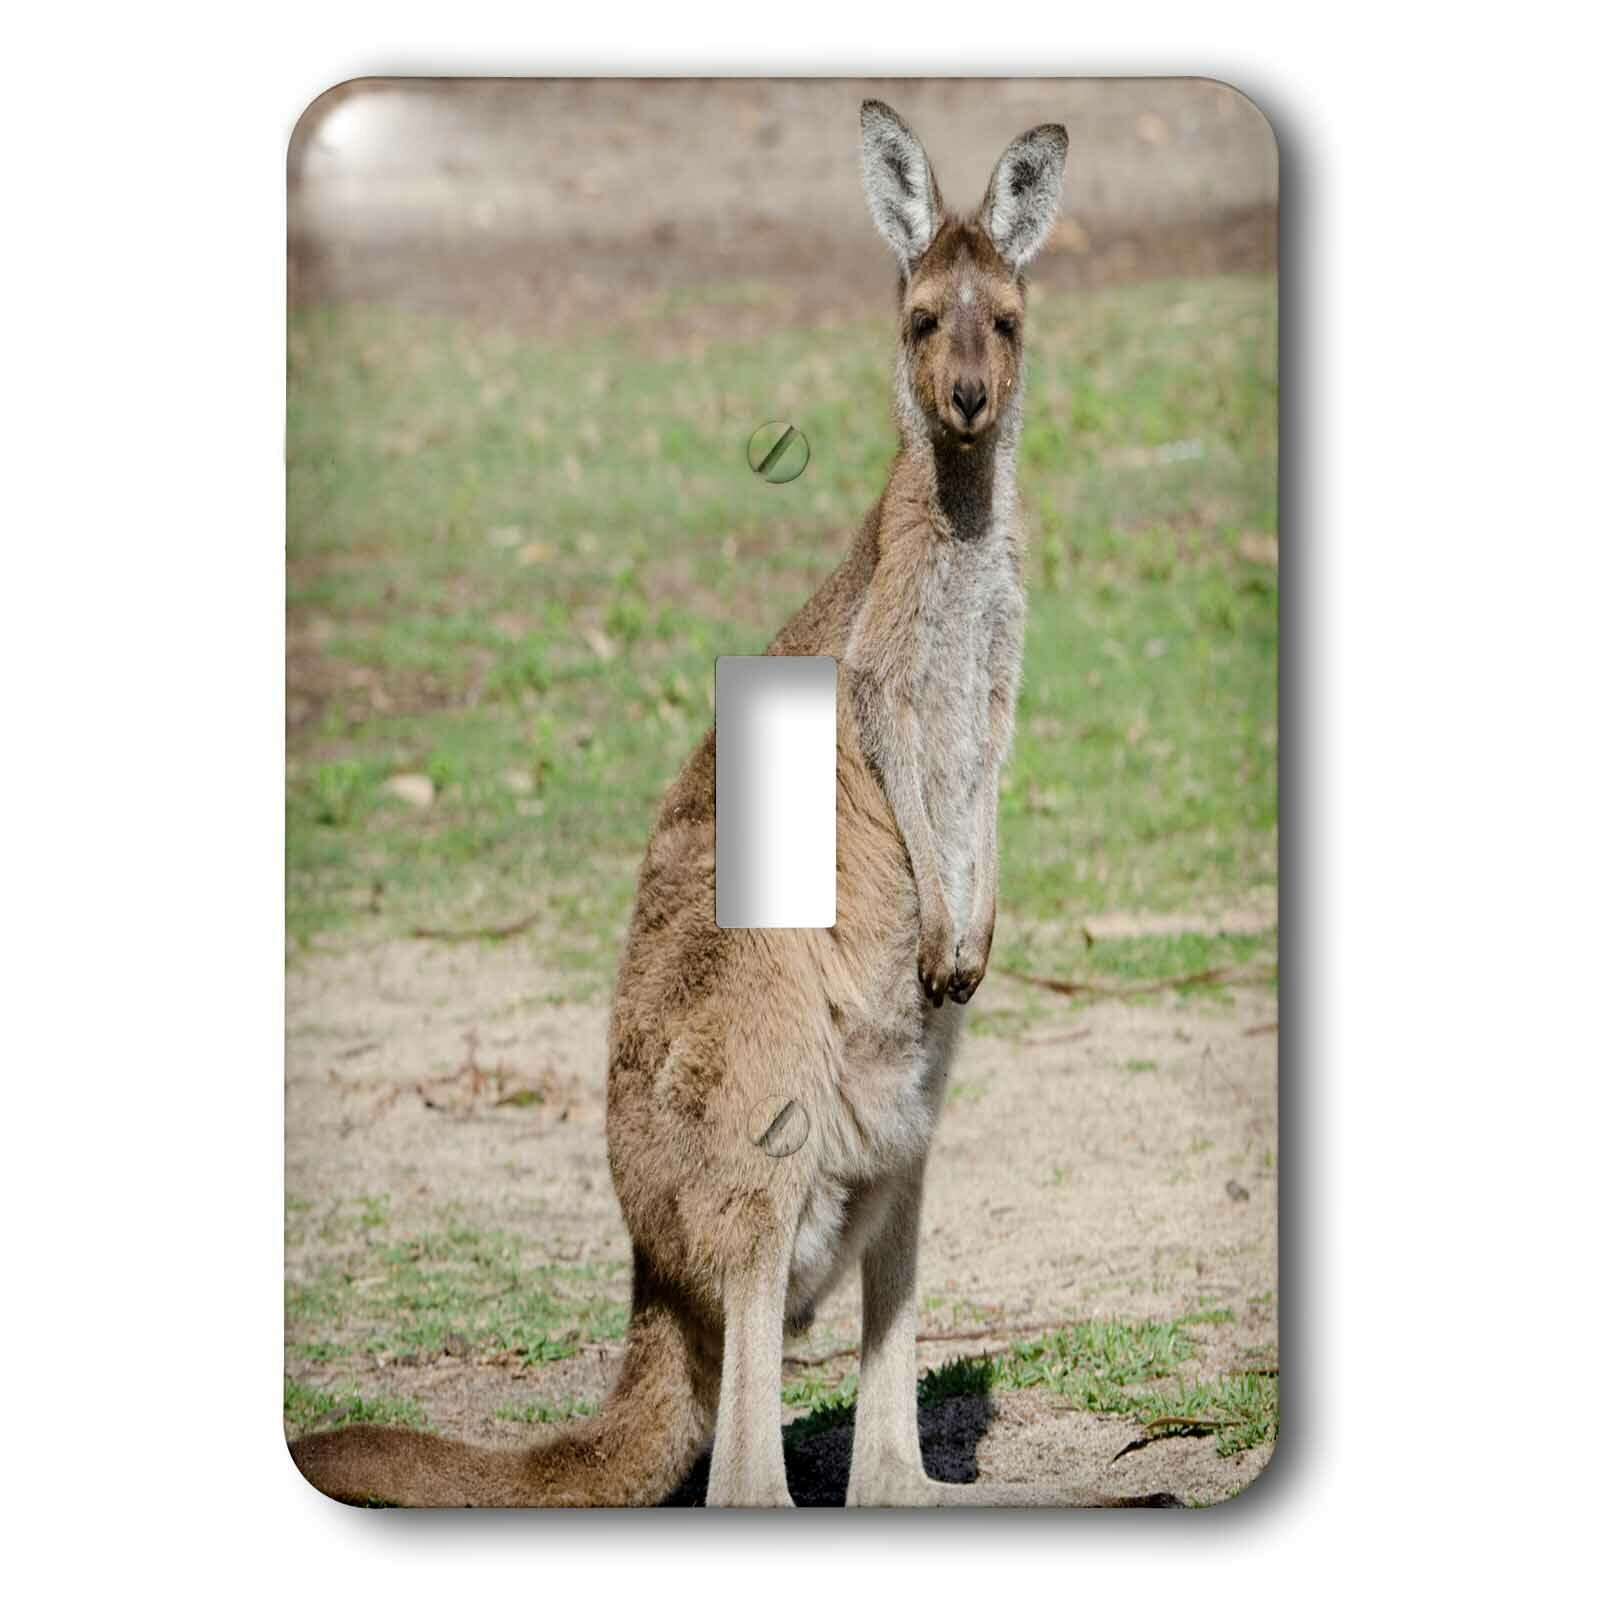 3drose Australia Kangaroo 1 Gang Toggle Light Switch Wall Plate Wayfair